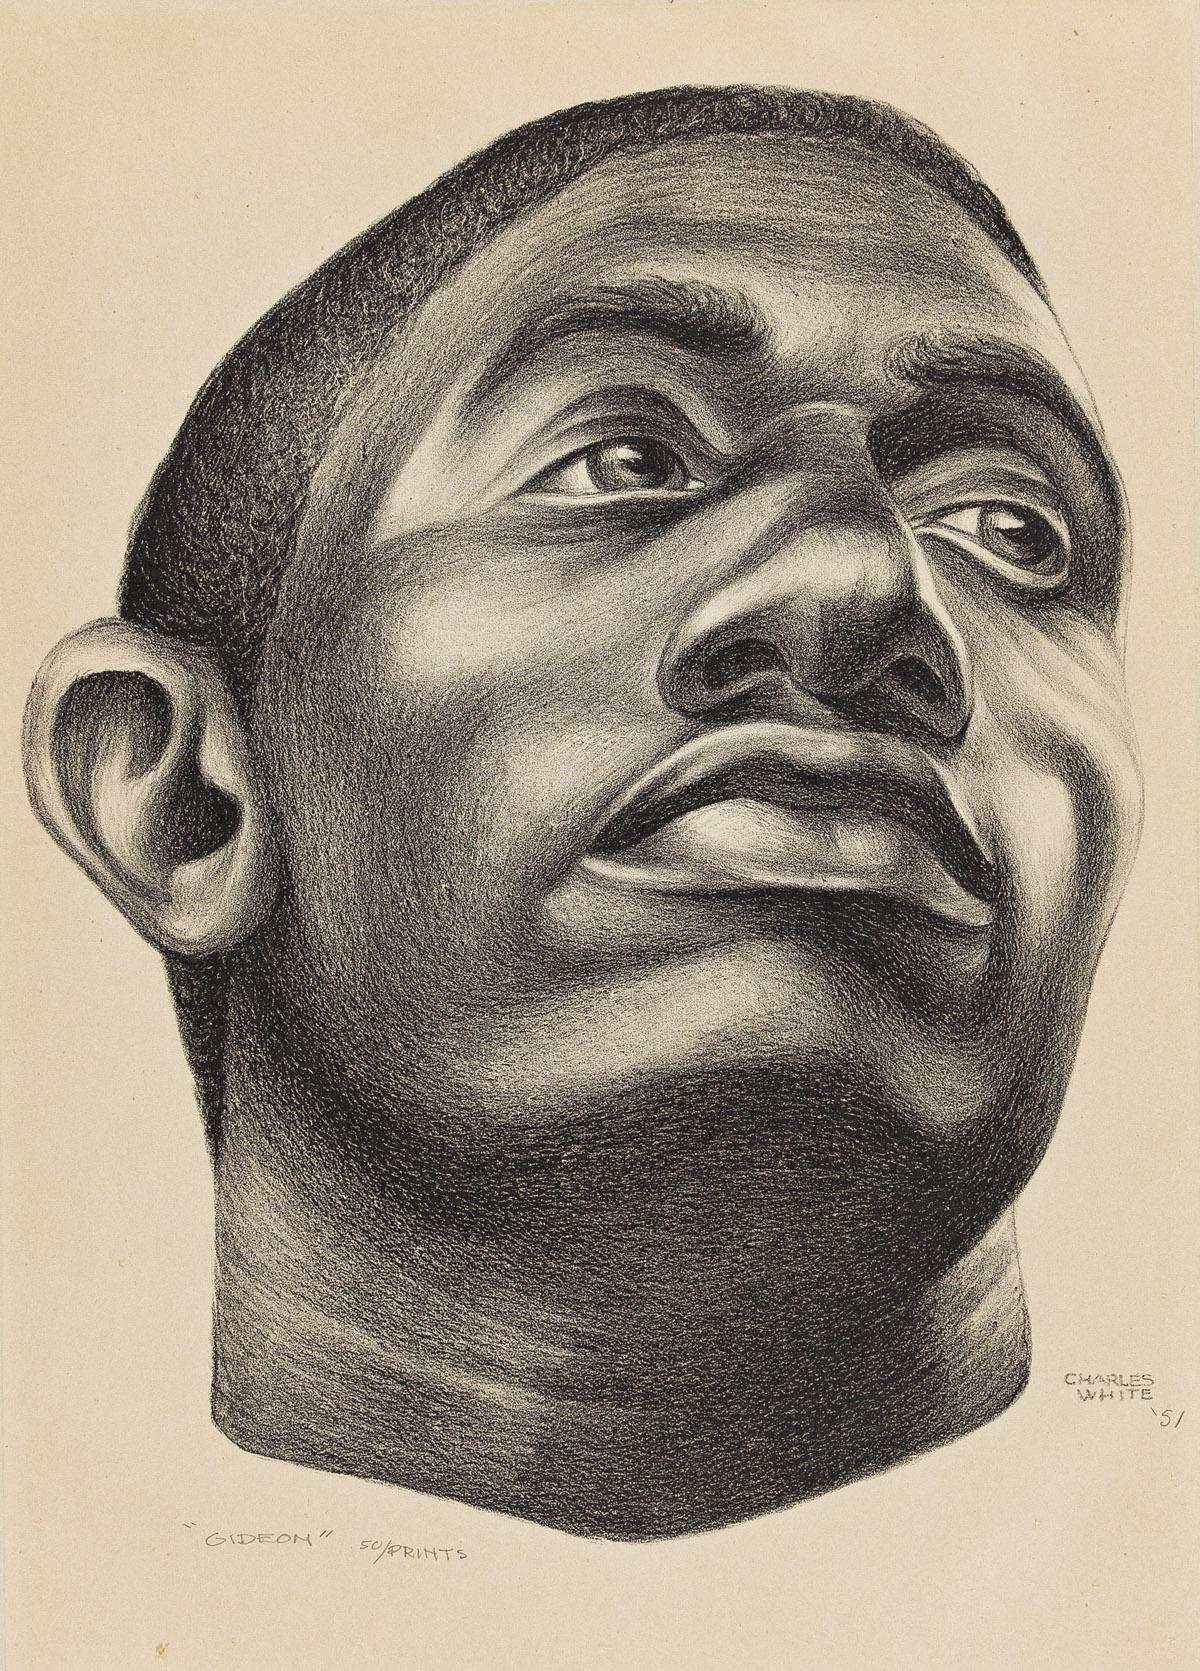 CHARLES WHITE (1918 - 1979) Gideon.